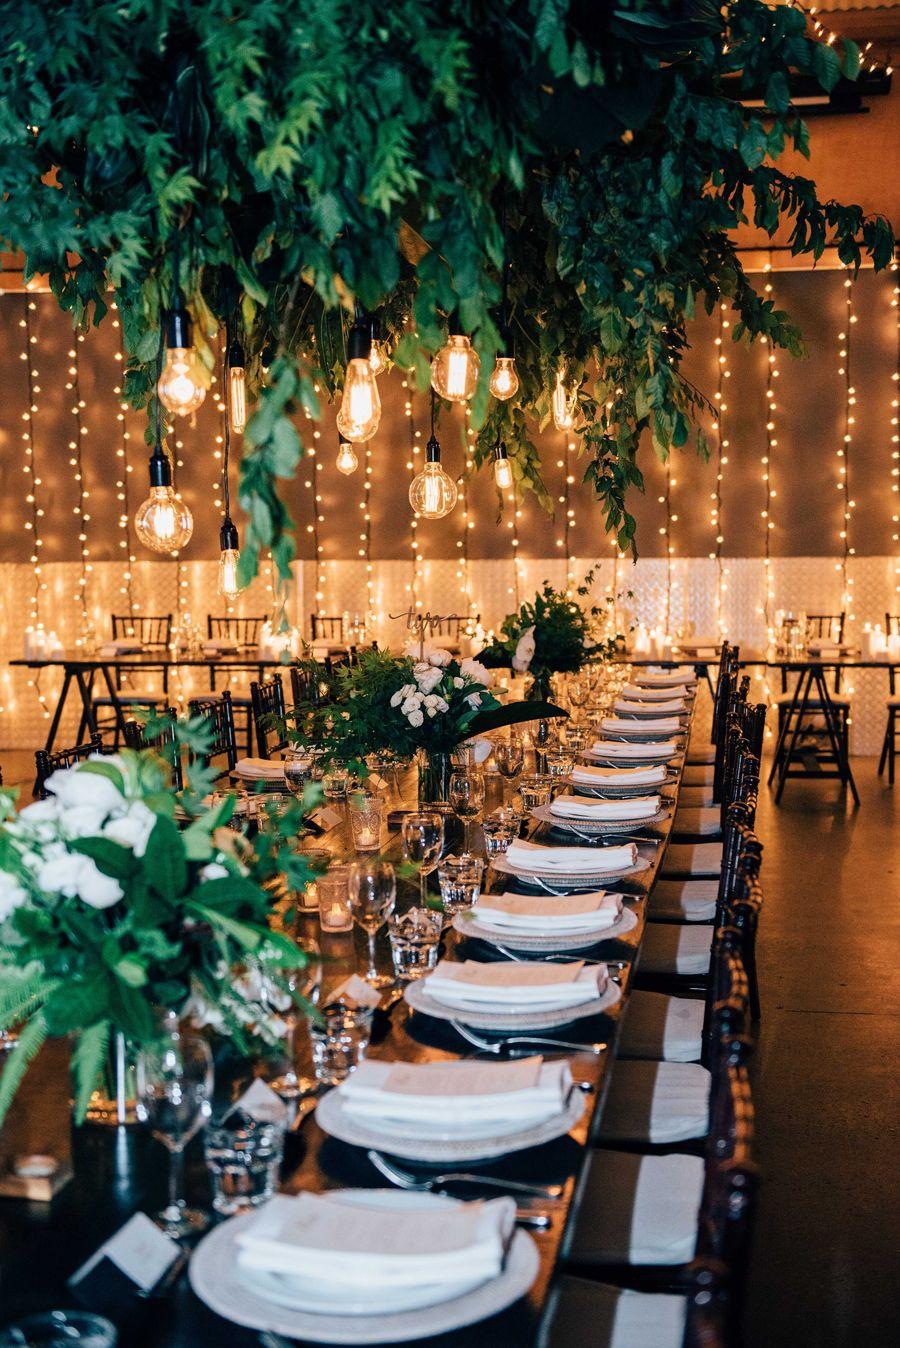 wedding receptions gold coast qld%0A Anna   Nathan    Osteria Casuarina  Figtree Tweed Coast Wedding Photography    Anna campbell  Weddings and Wedding